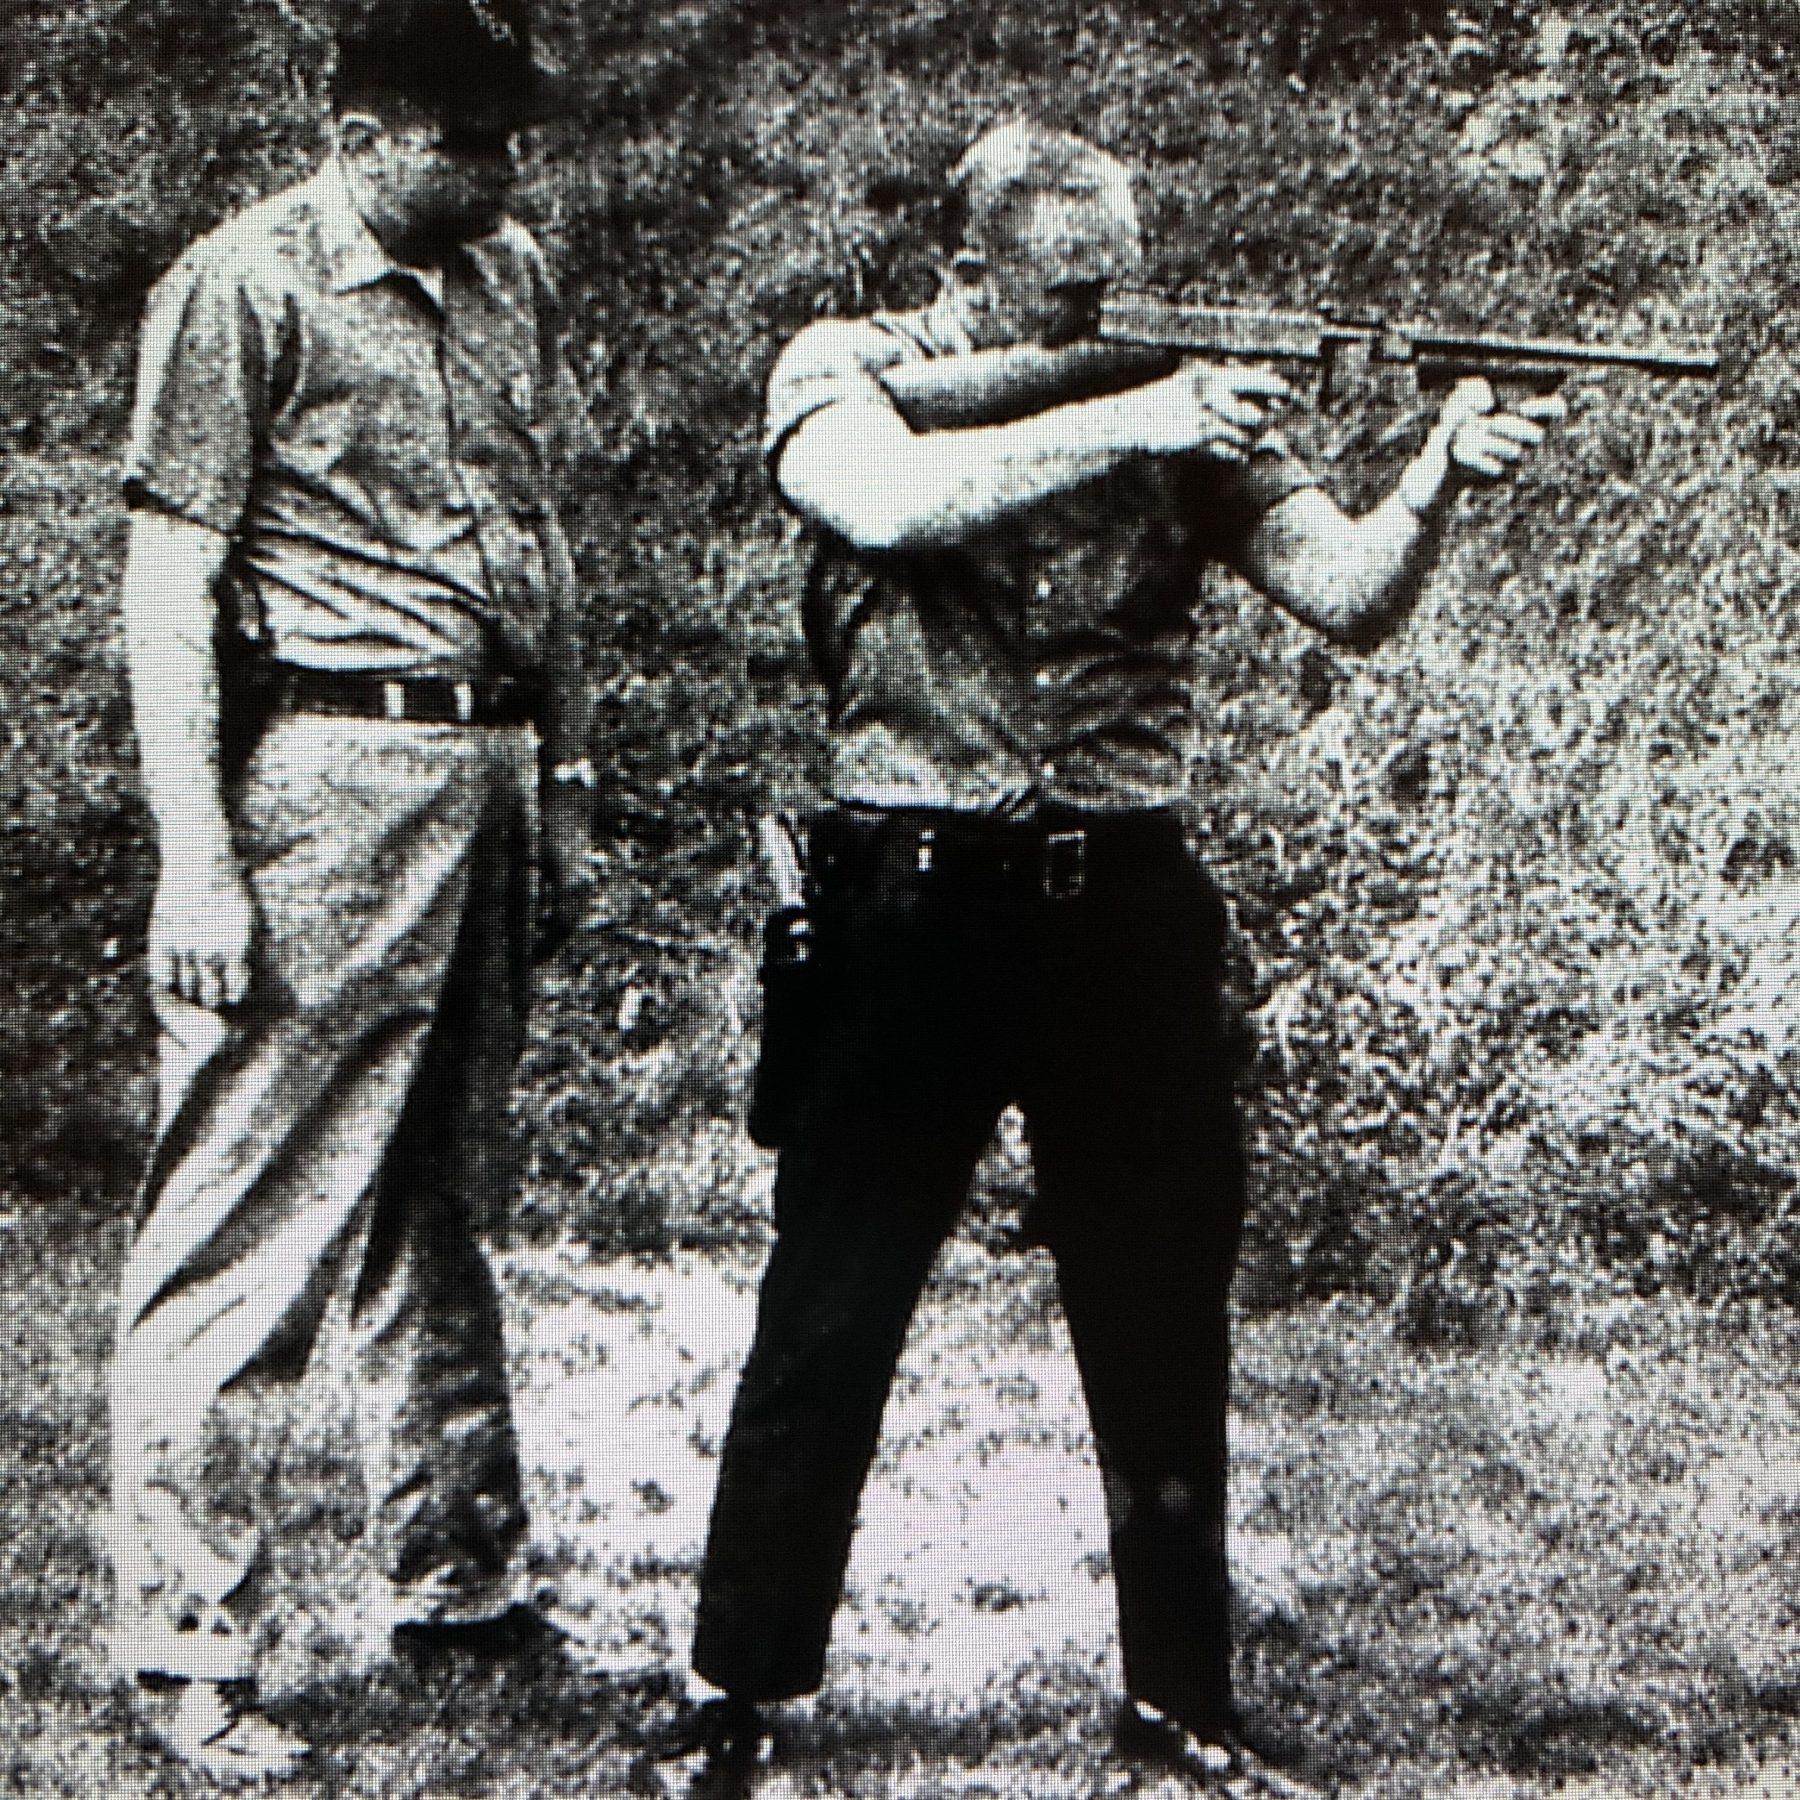 Officer Richard Sheppard in training, Burlington MA